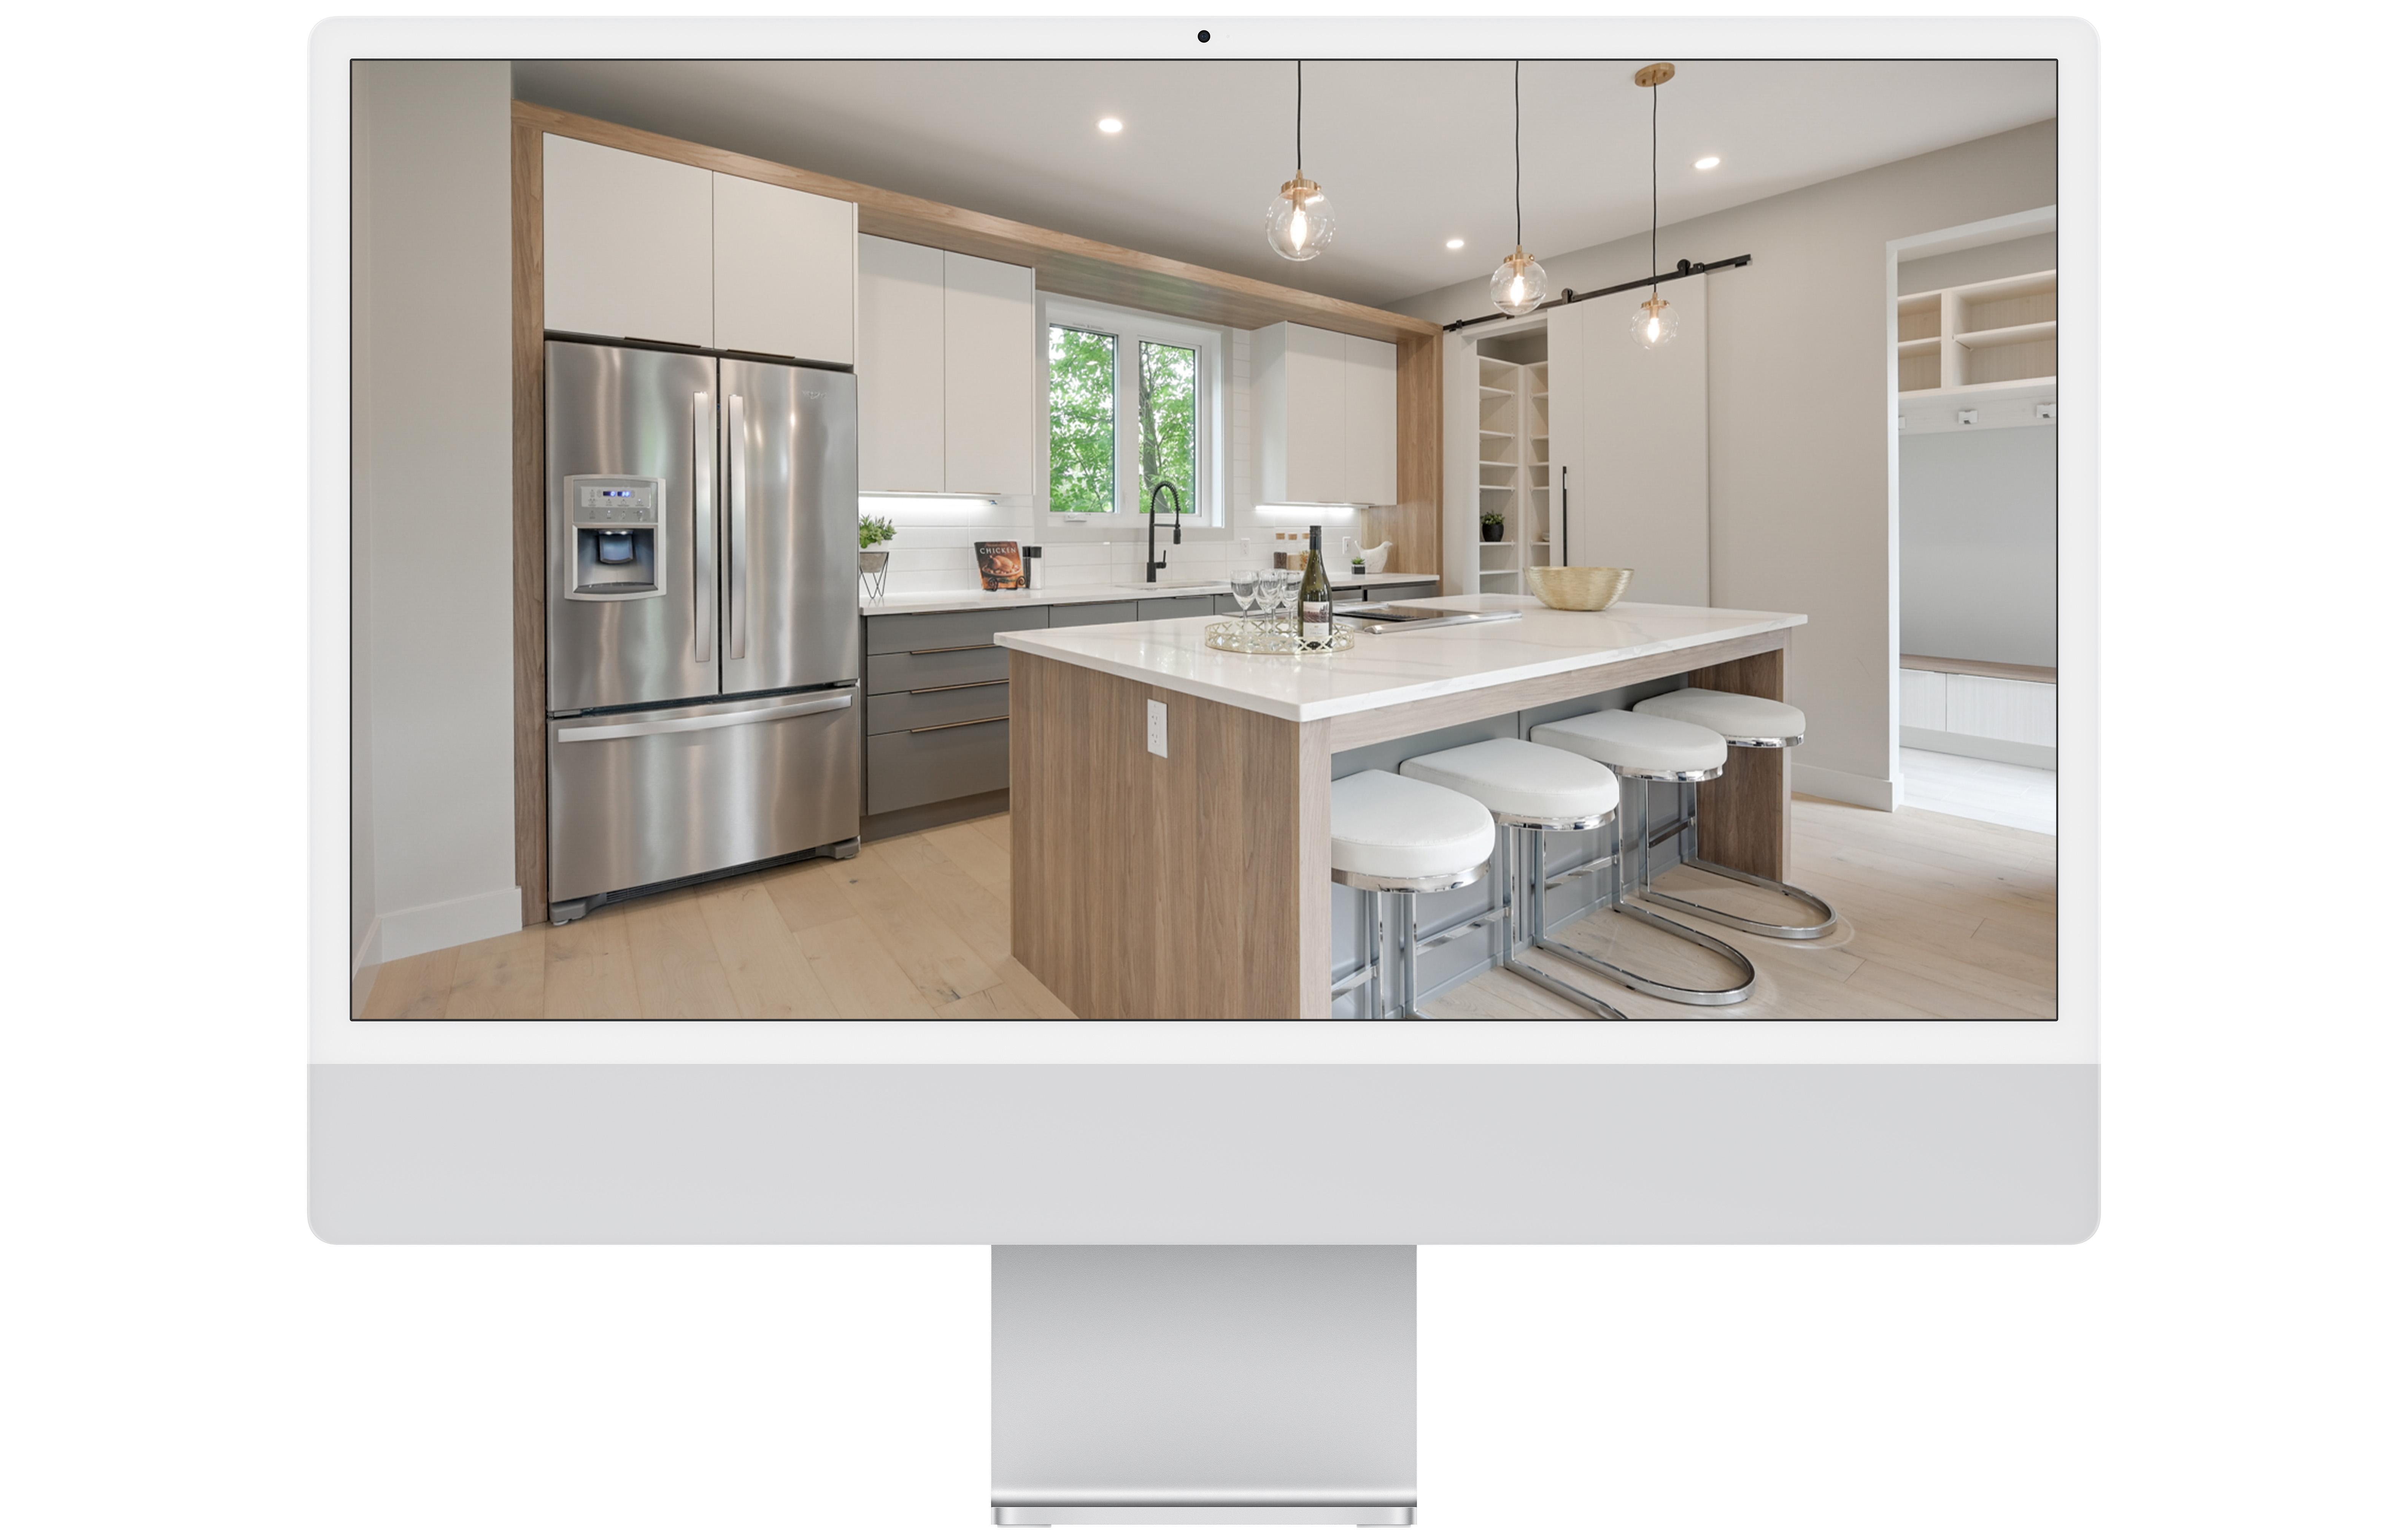 Modern living room of rental property